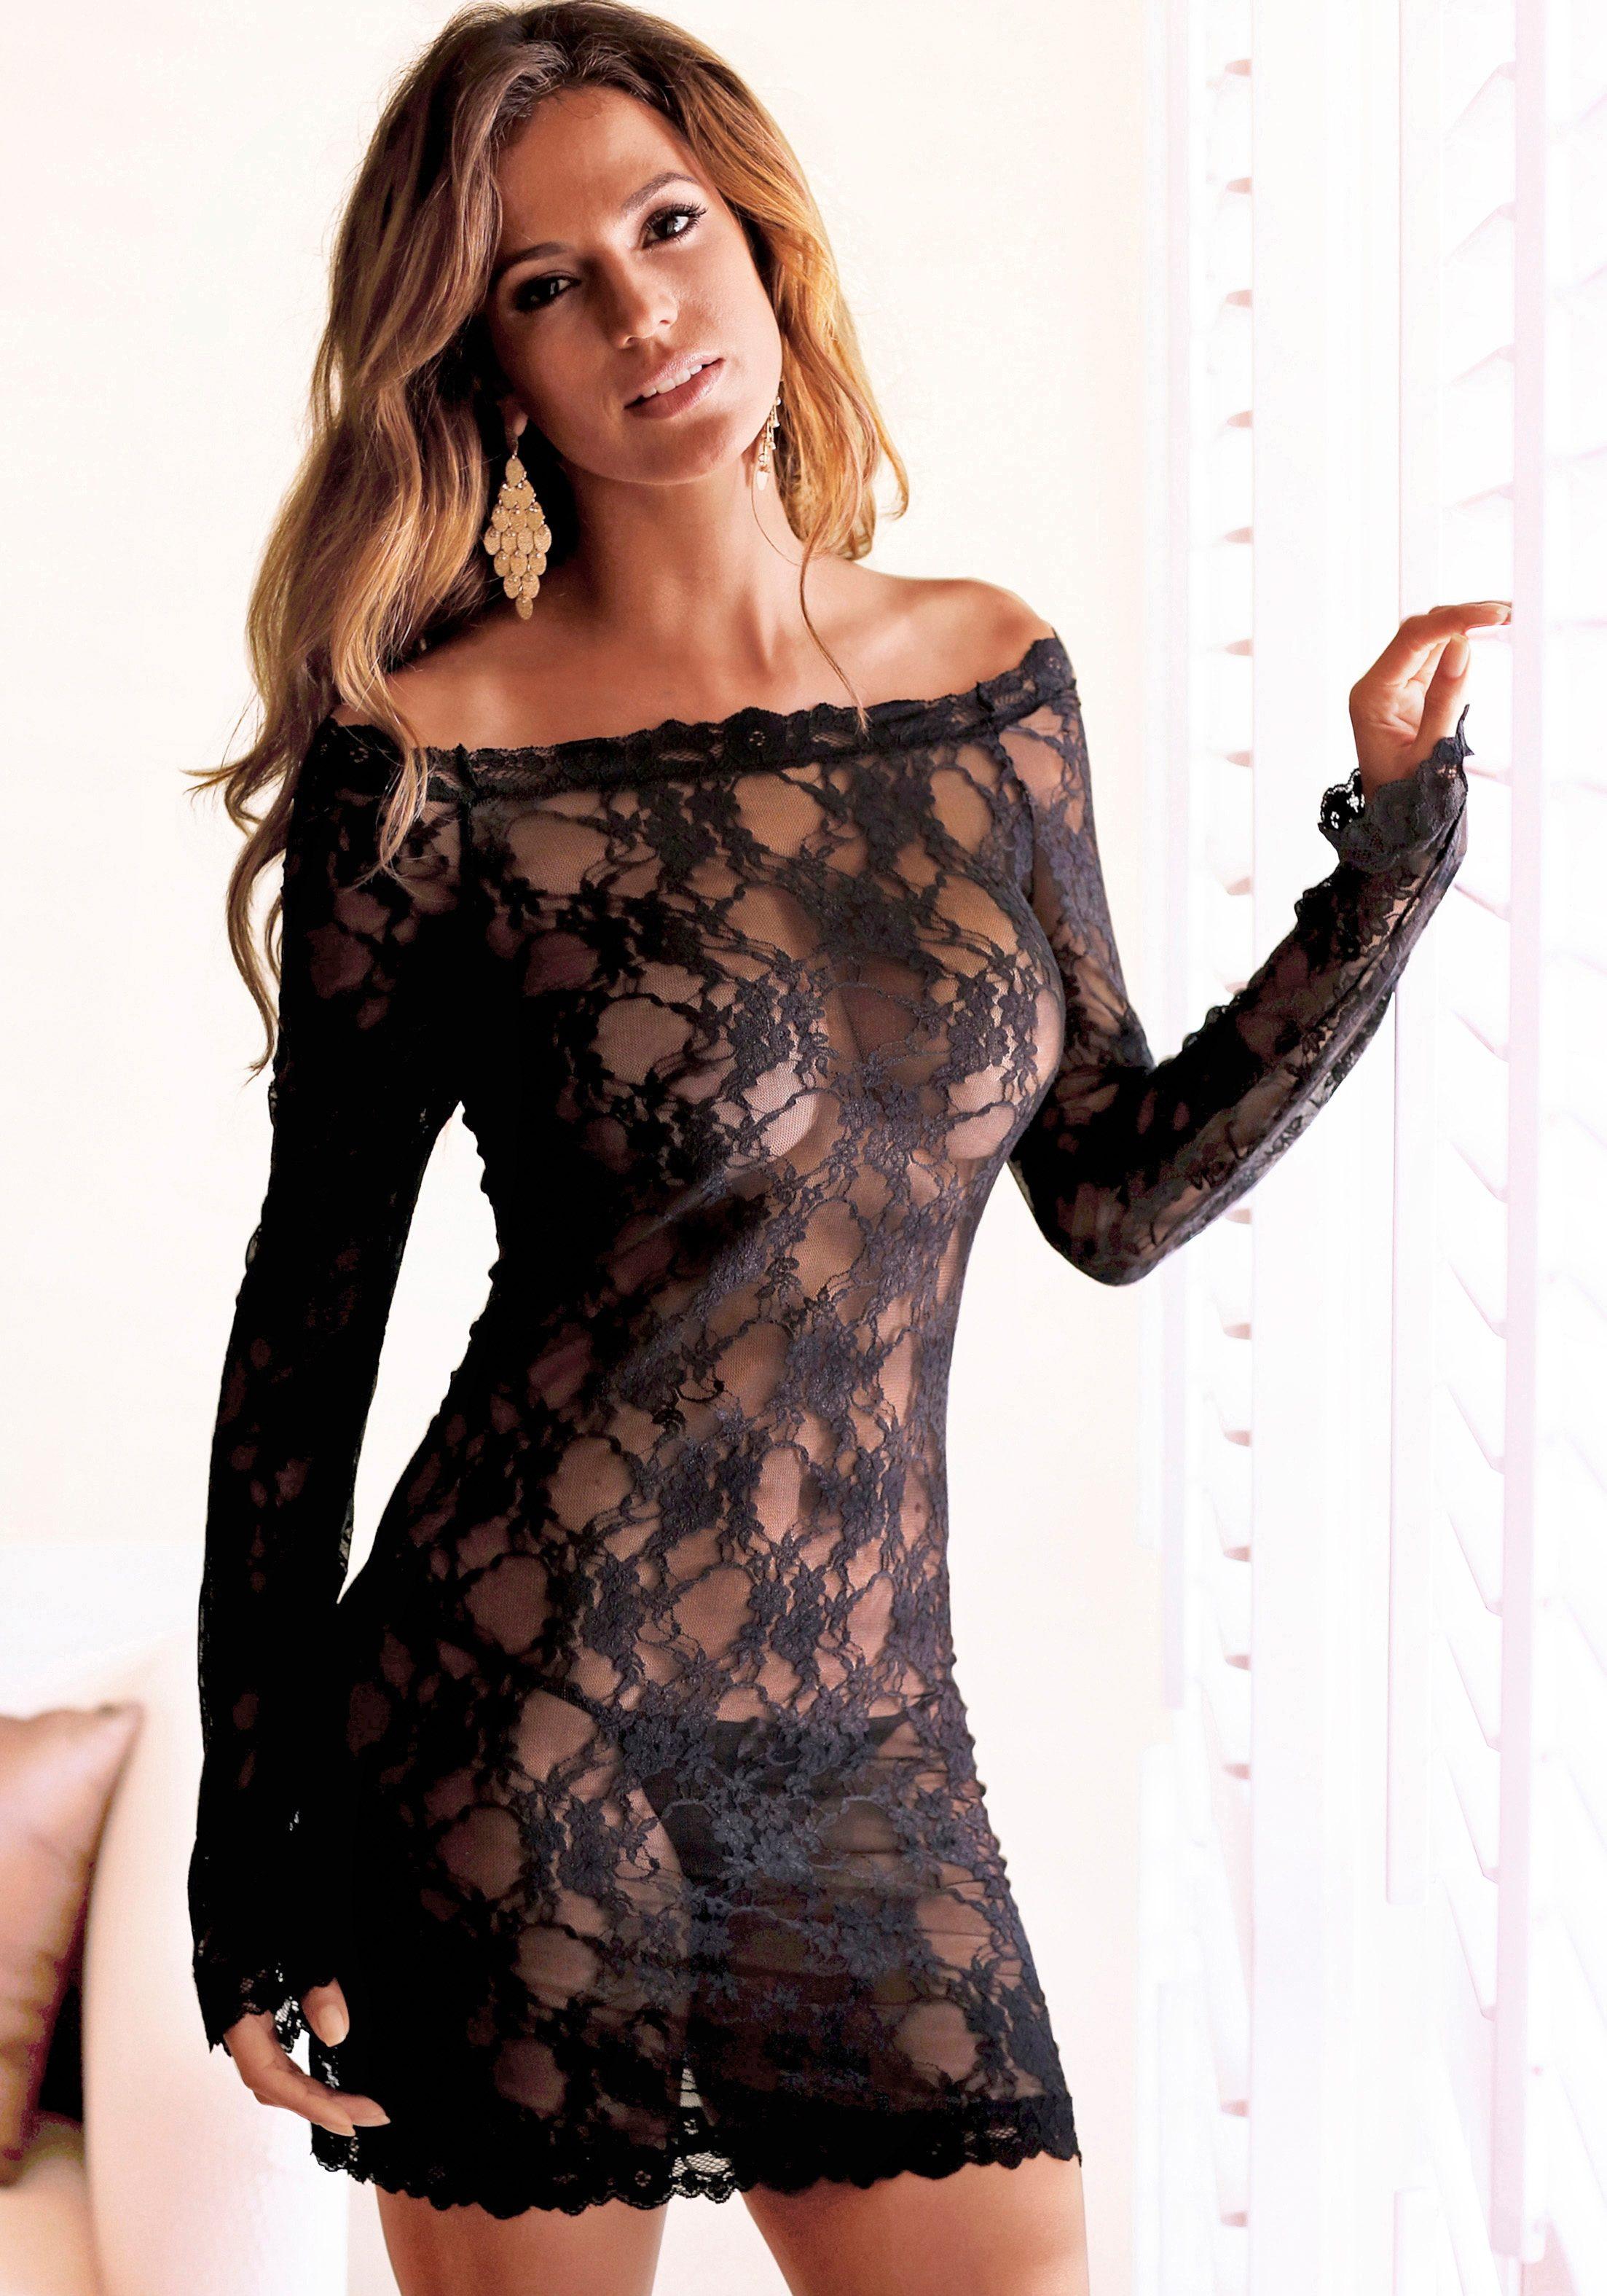 LASCANA Spitzenkleid, aus Spitze schwarz Damen Spitzenkleid Spitzenkleider Kleider